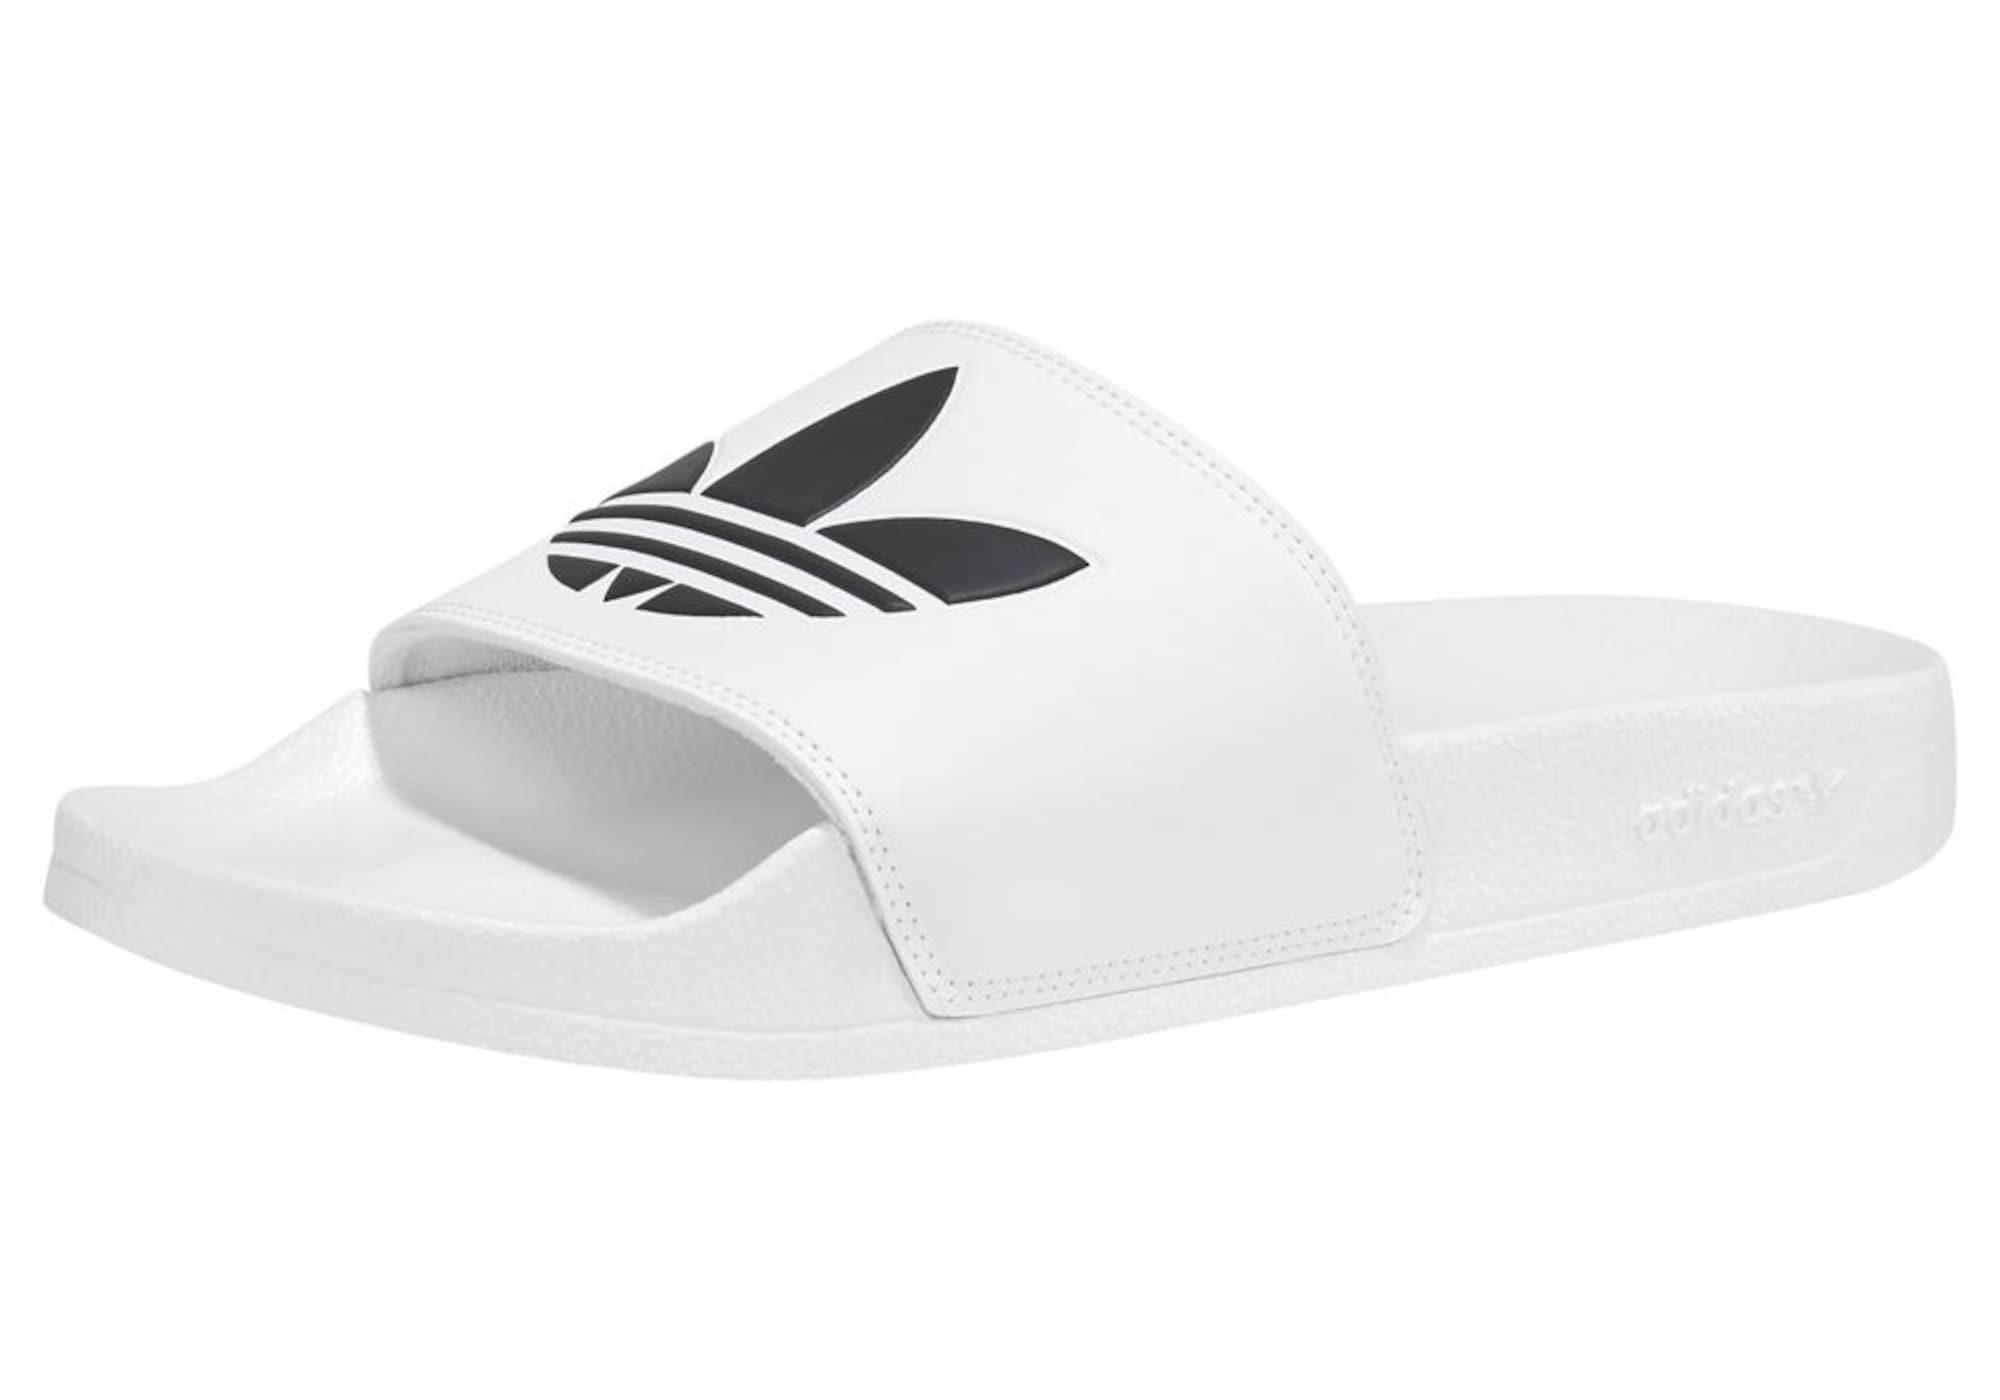 ADIDAS ORIGINALS Šľapky 'Adilette Lite'  biela / čierna